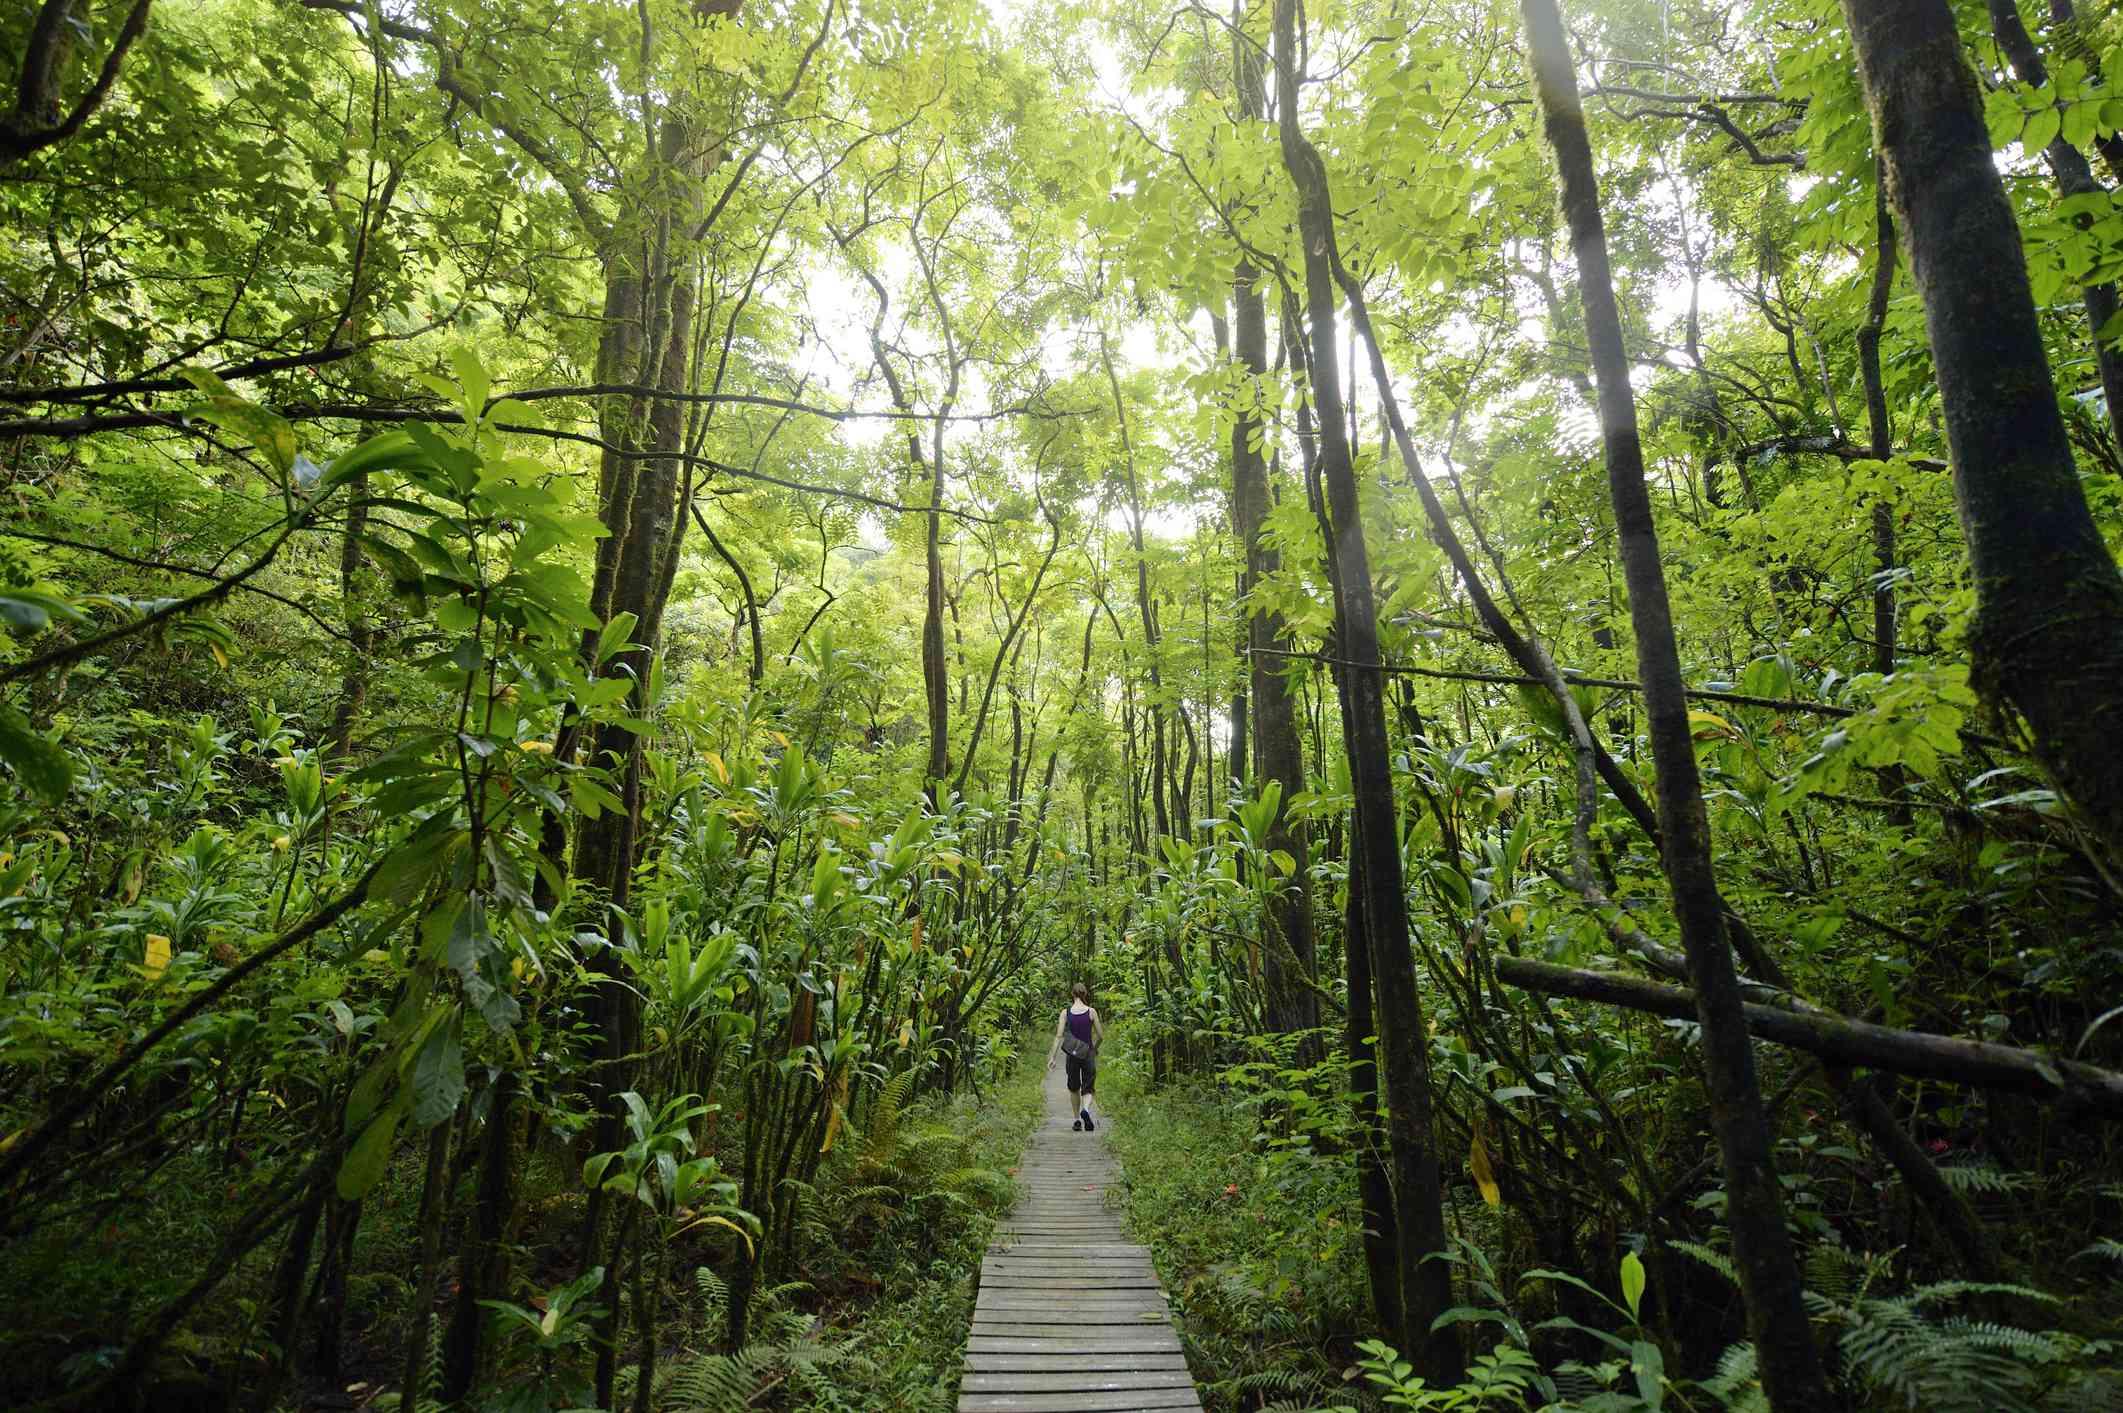 Bamboo forest inside Pipiwai Trail on Maui